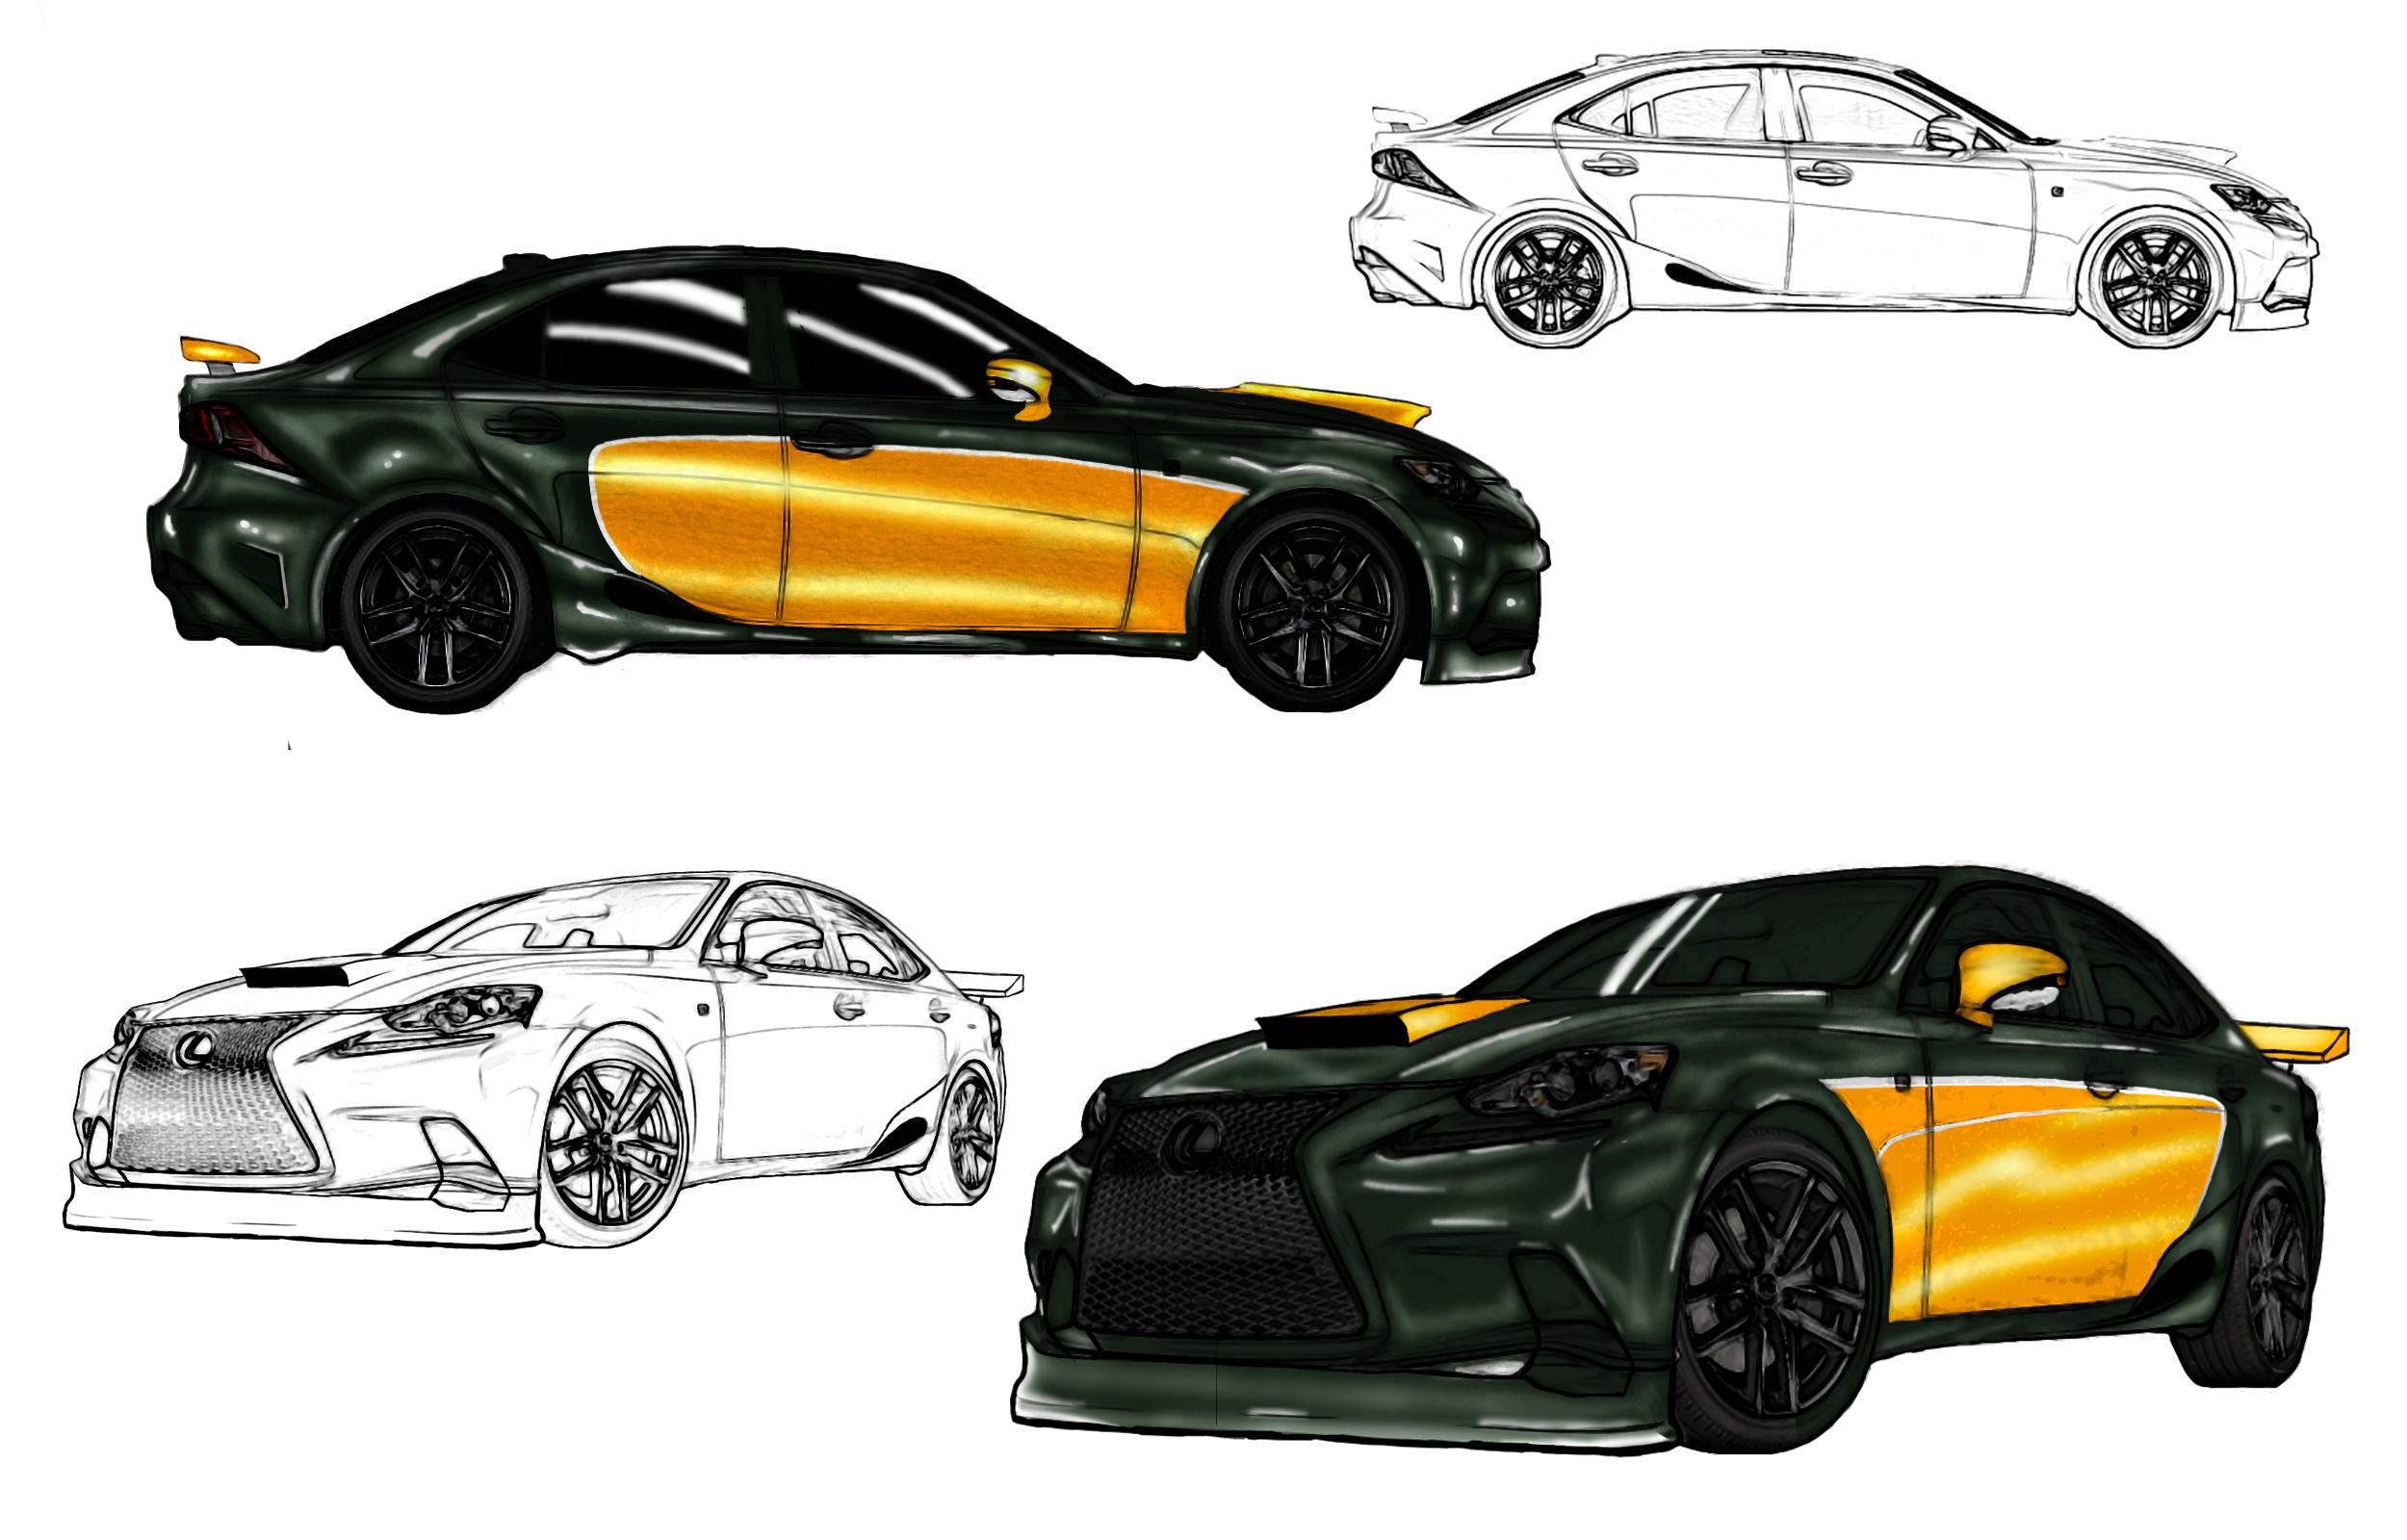 Lexus IS (tiger instinct) by jshoemake15